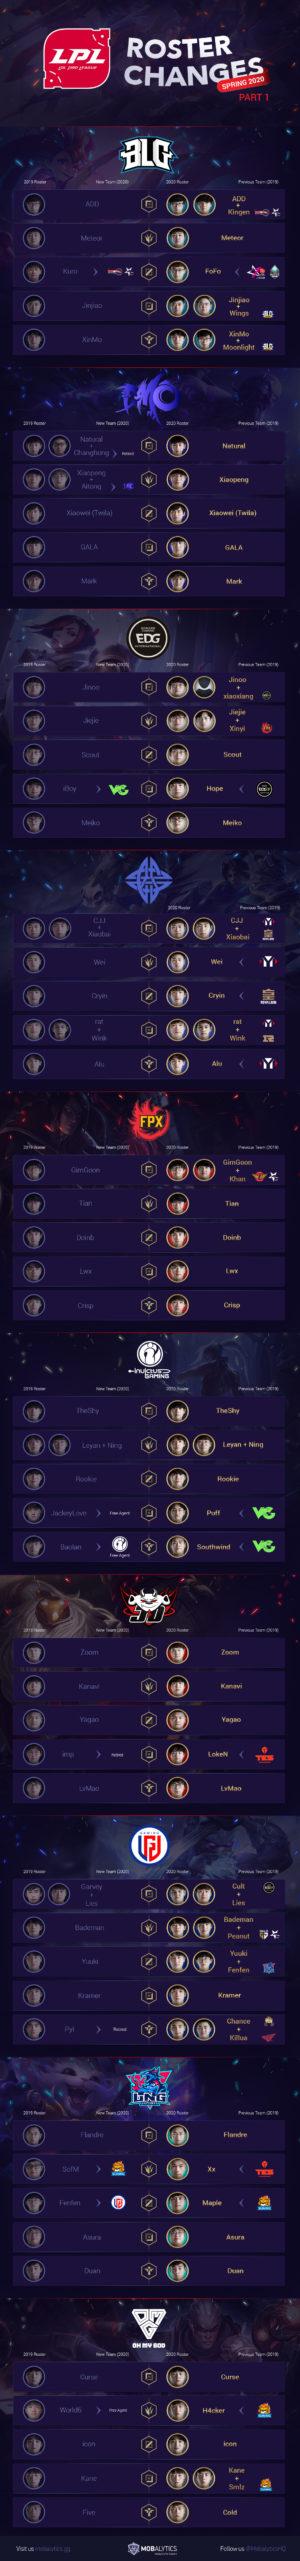 LPL Roster Changes Infographic (Spring 2020 Teams, Part I)